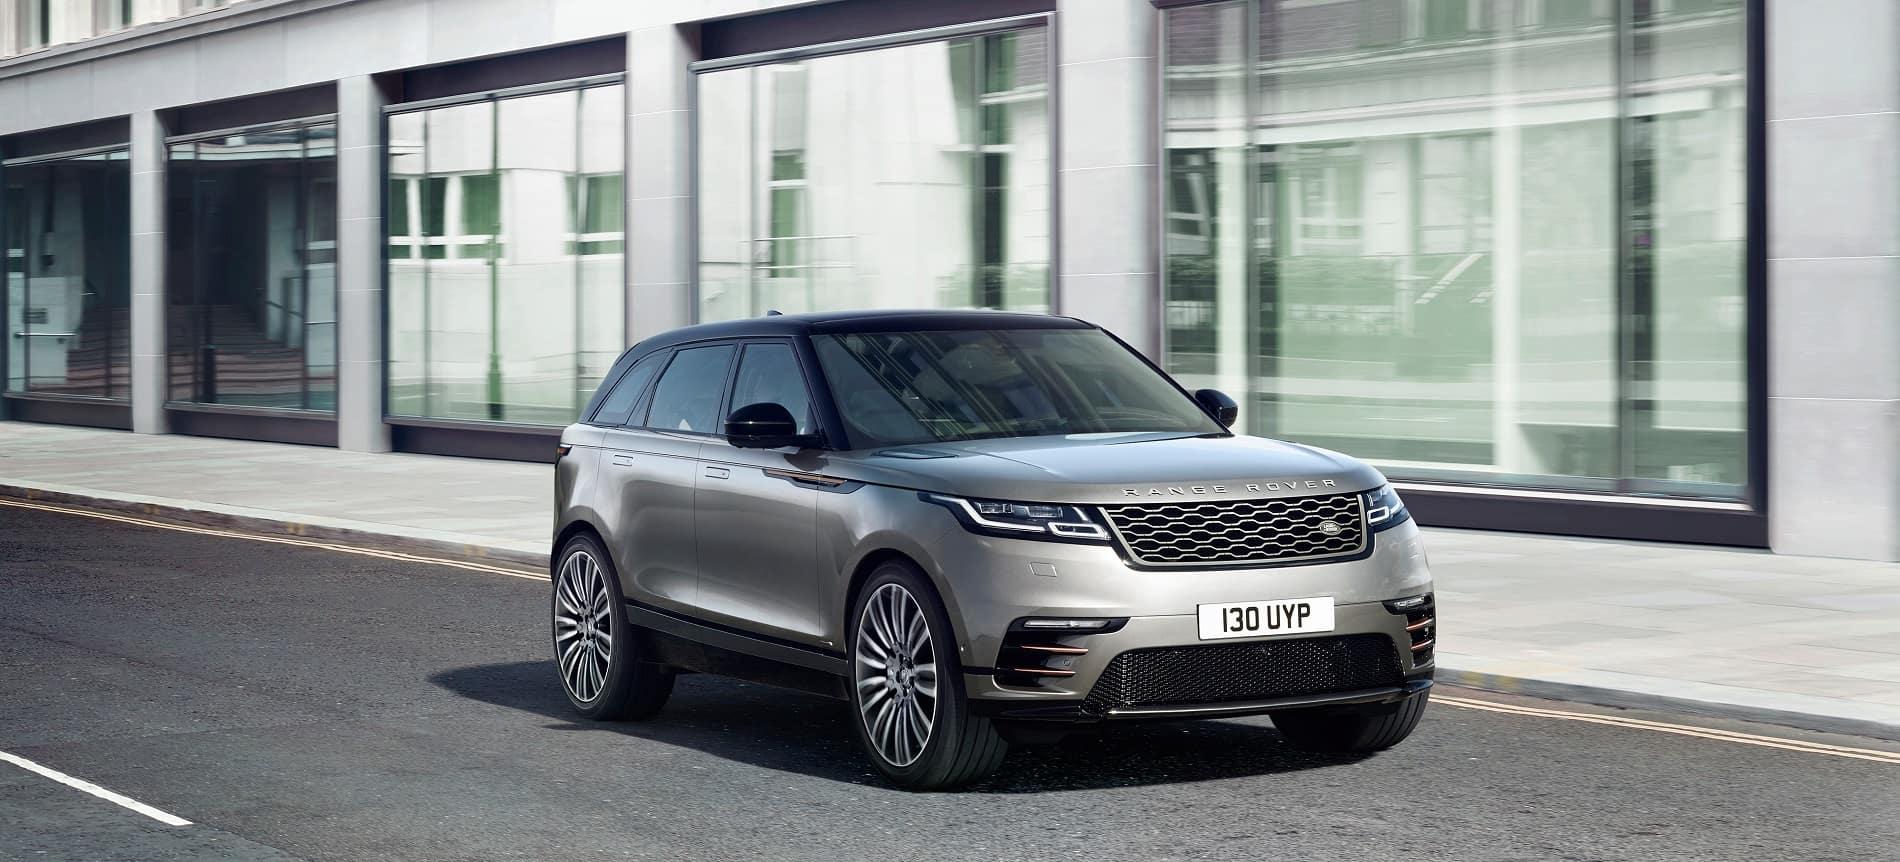 Range Rover Evoque Trade-Up Program to 2018 Range Rover Velar